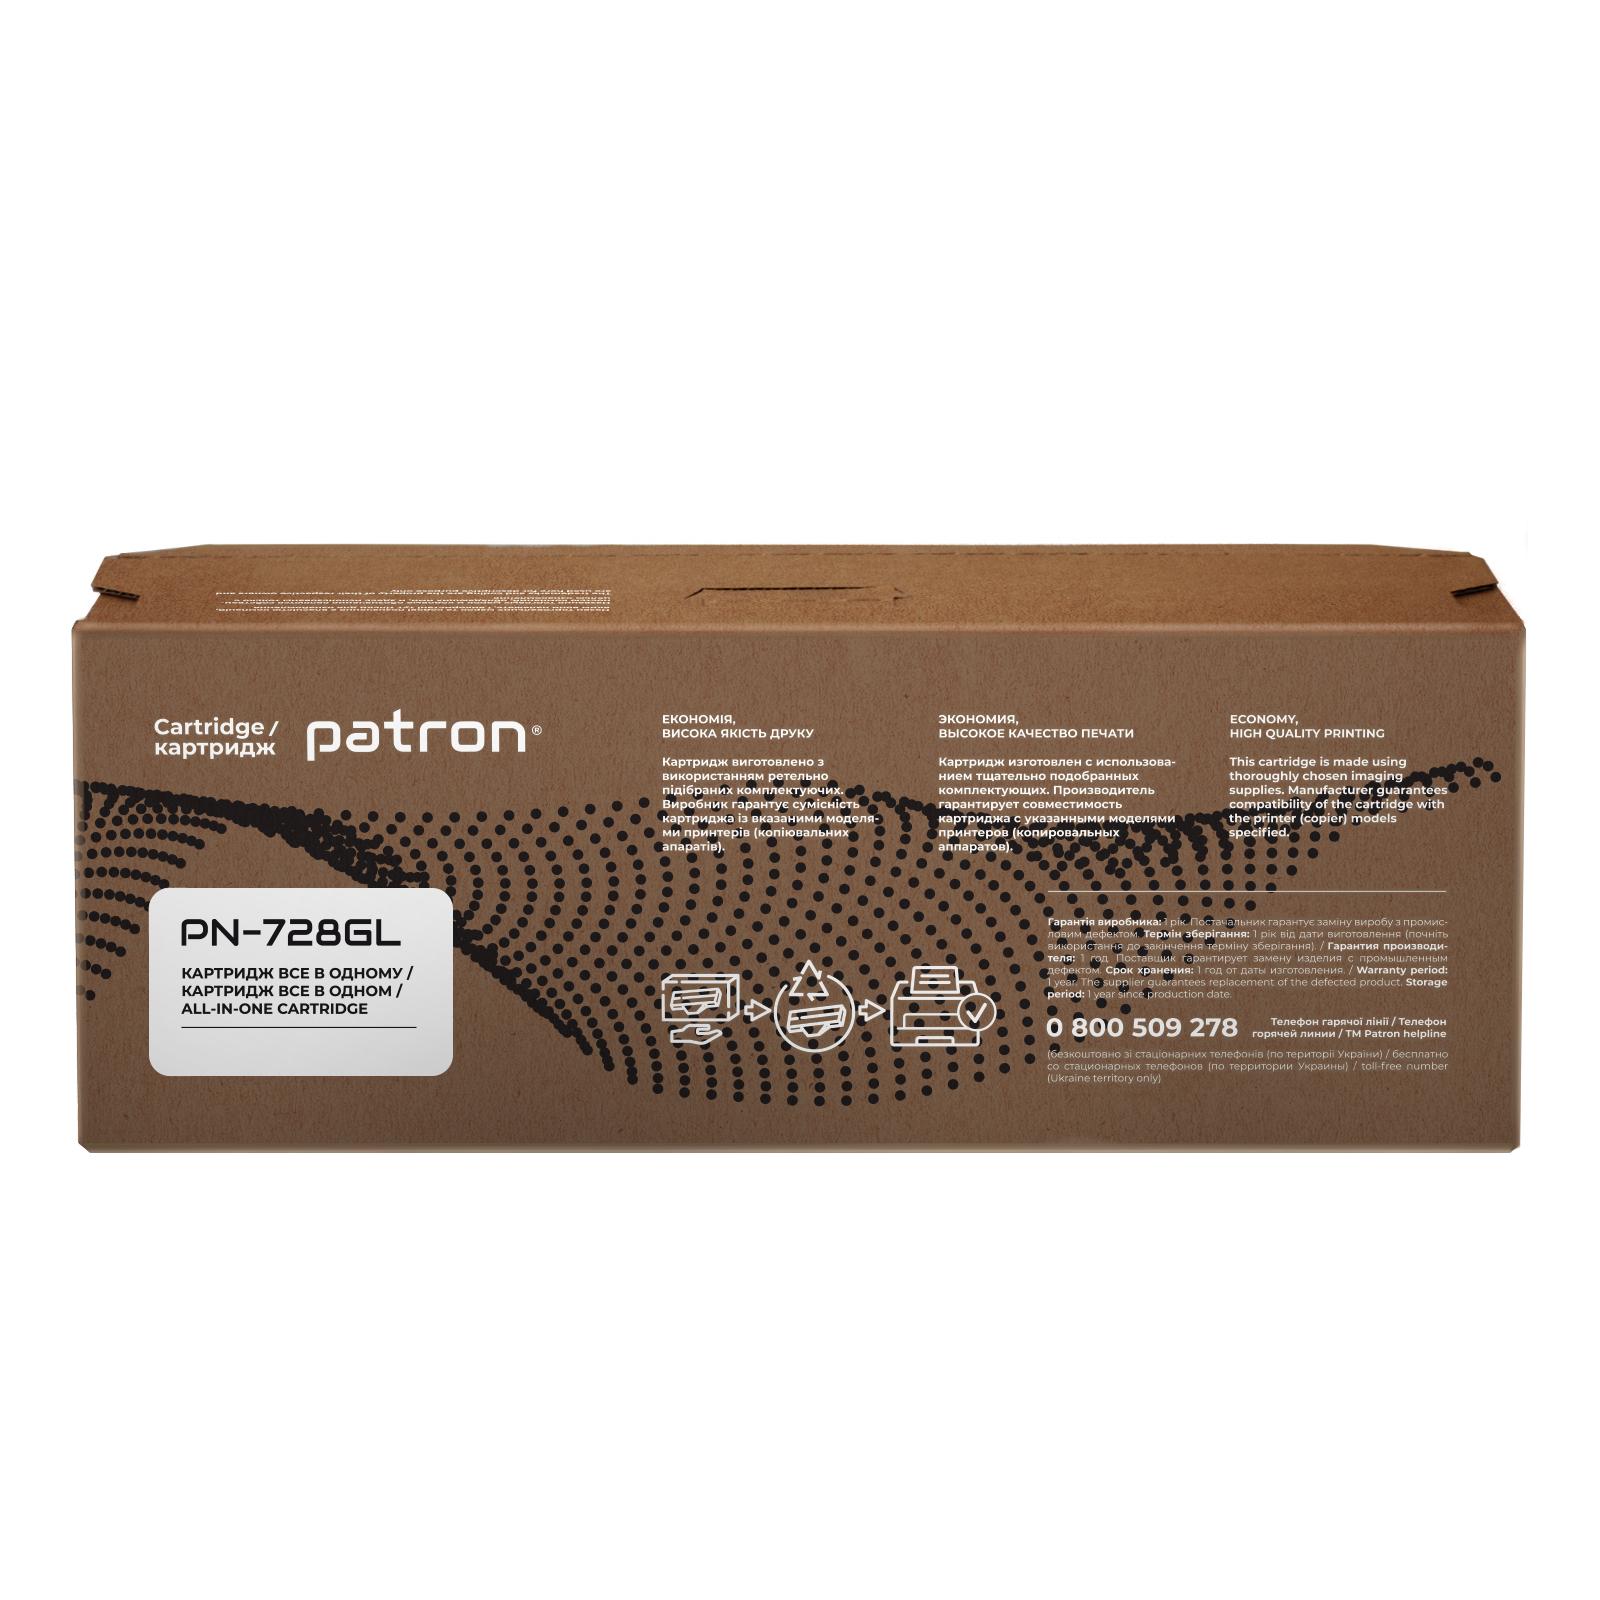 Картридж Patron CANON 728 GREEN Label (PN-728GL) изображение 5